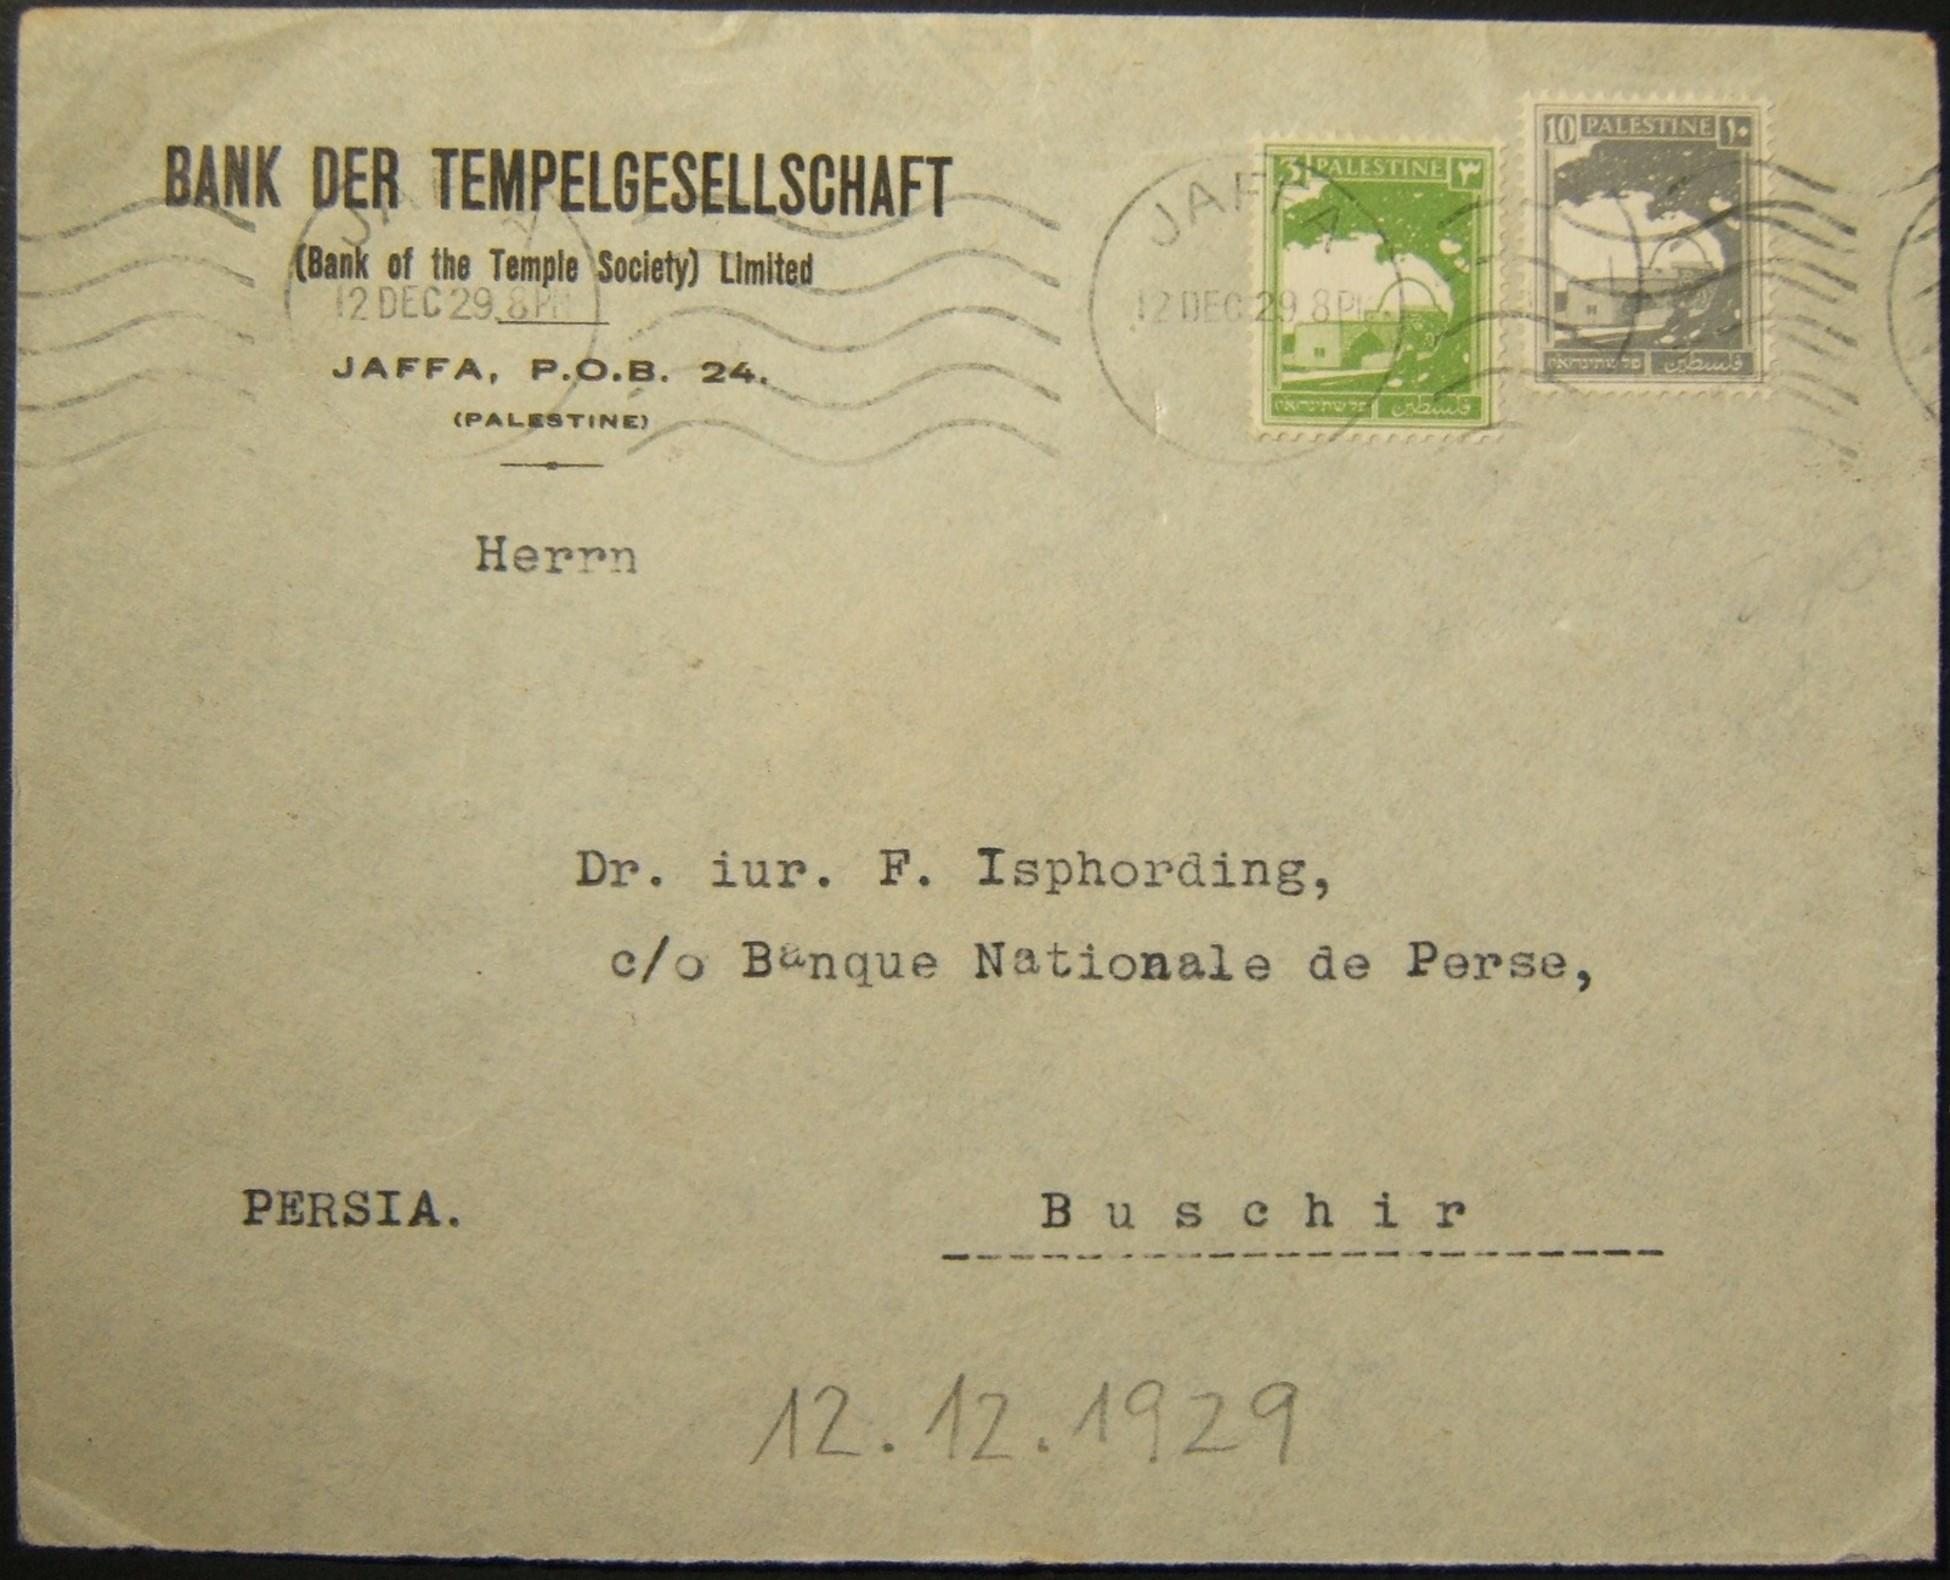 Eastbound mail: 12 DEC 1929 Templar Bank stationary cv ex JAFFA to BUSHEHR Iran, franked 13m using 3m & 10m (Ba91/97) per period